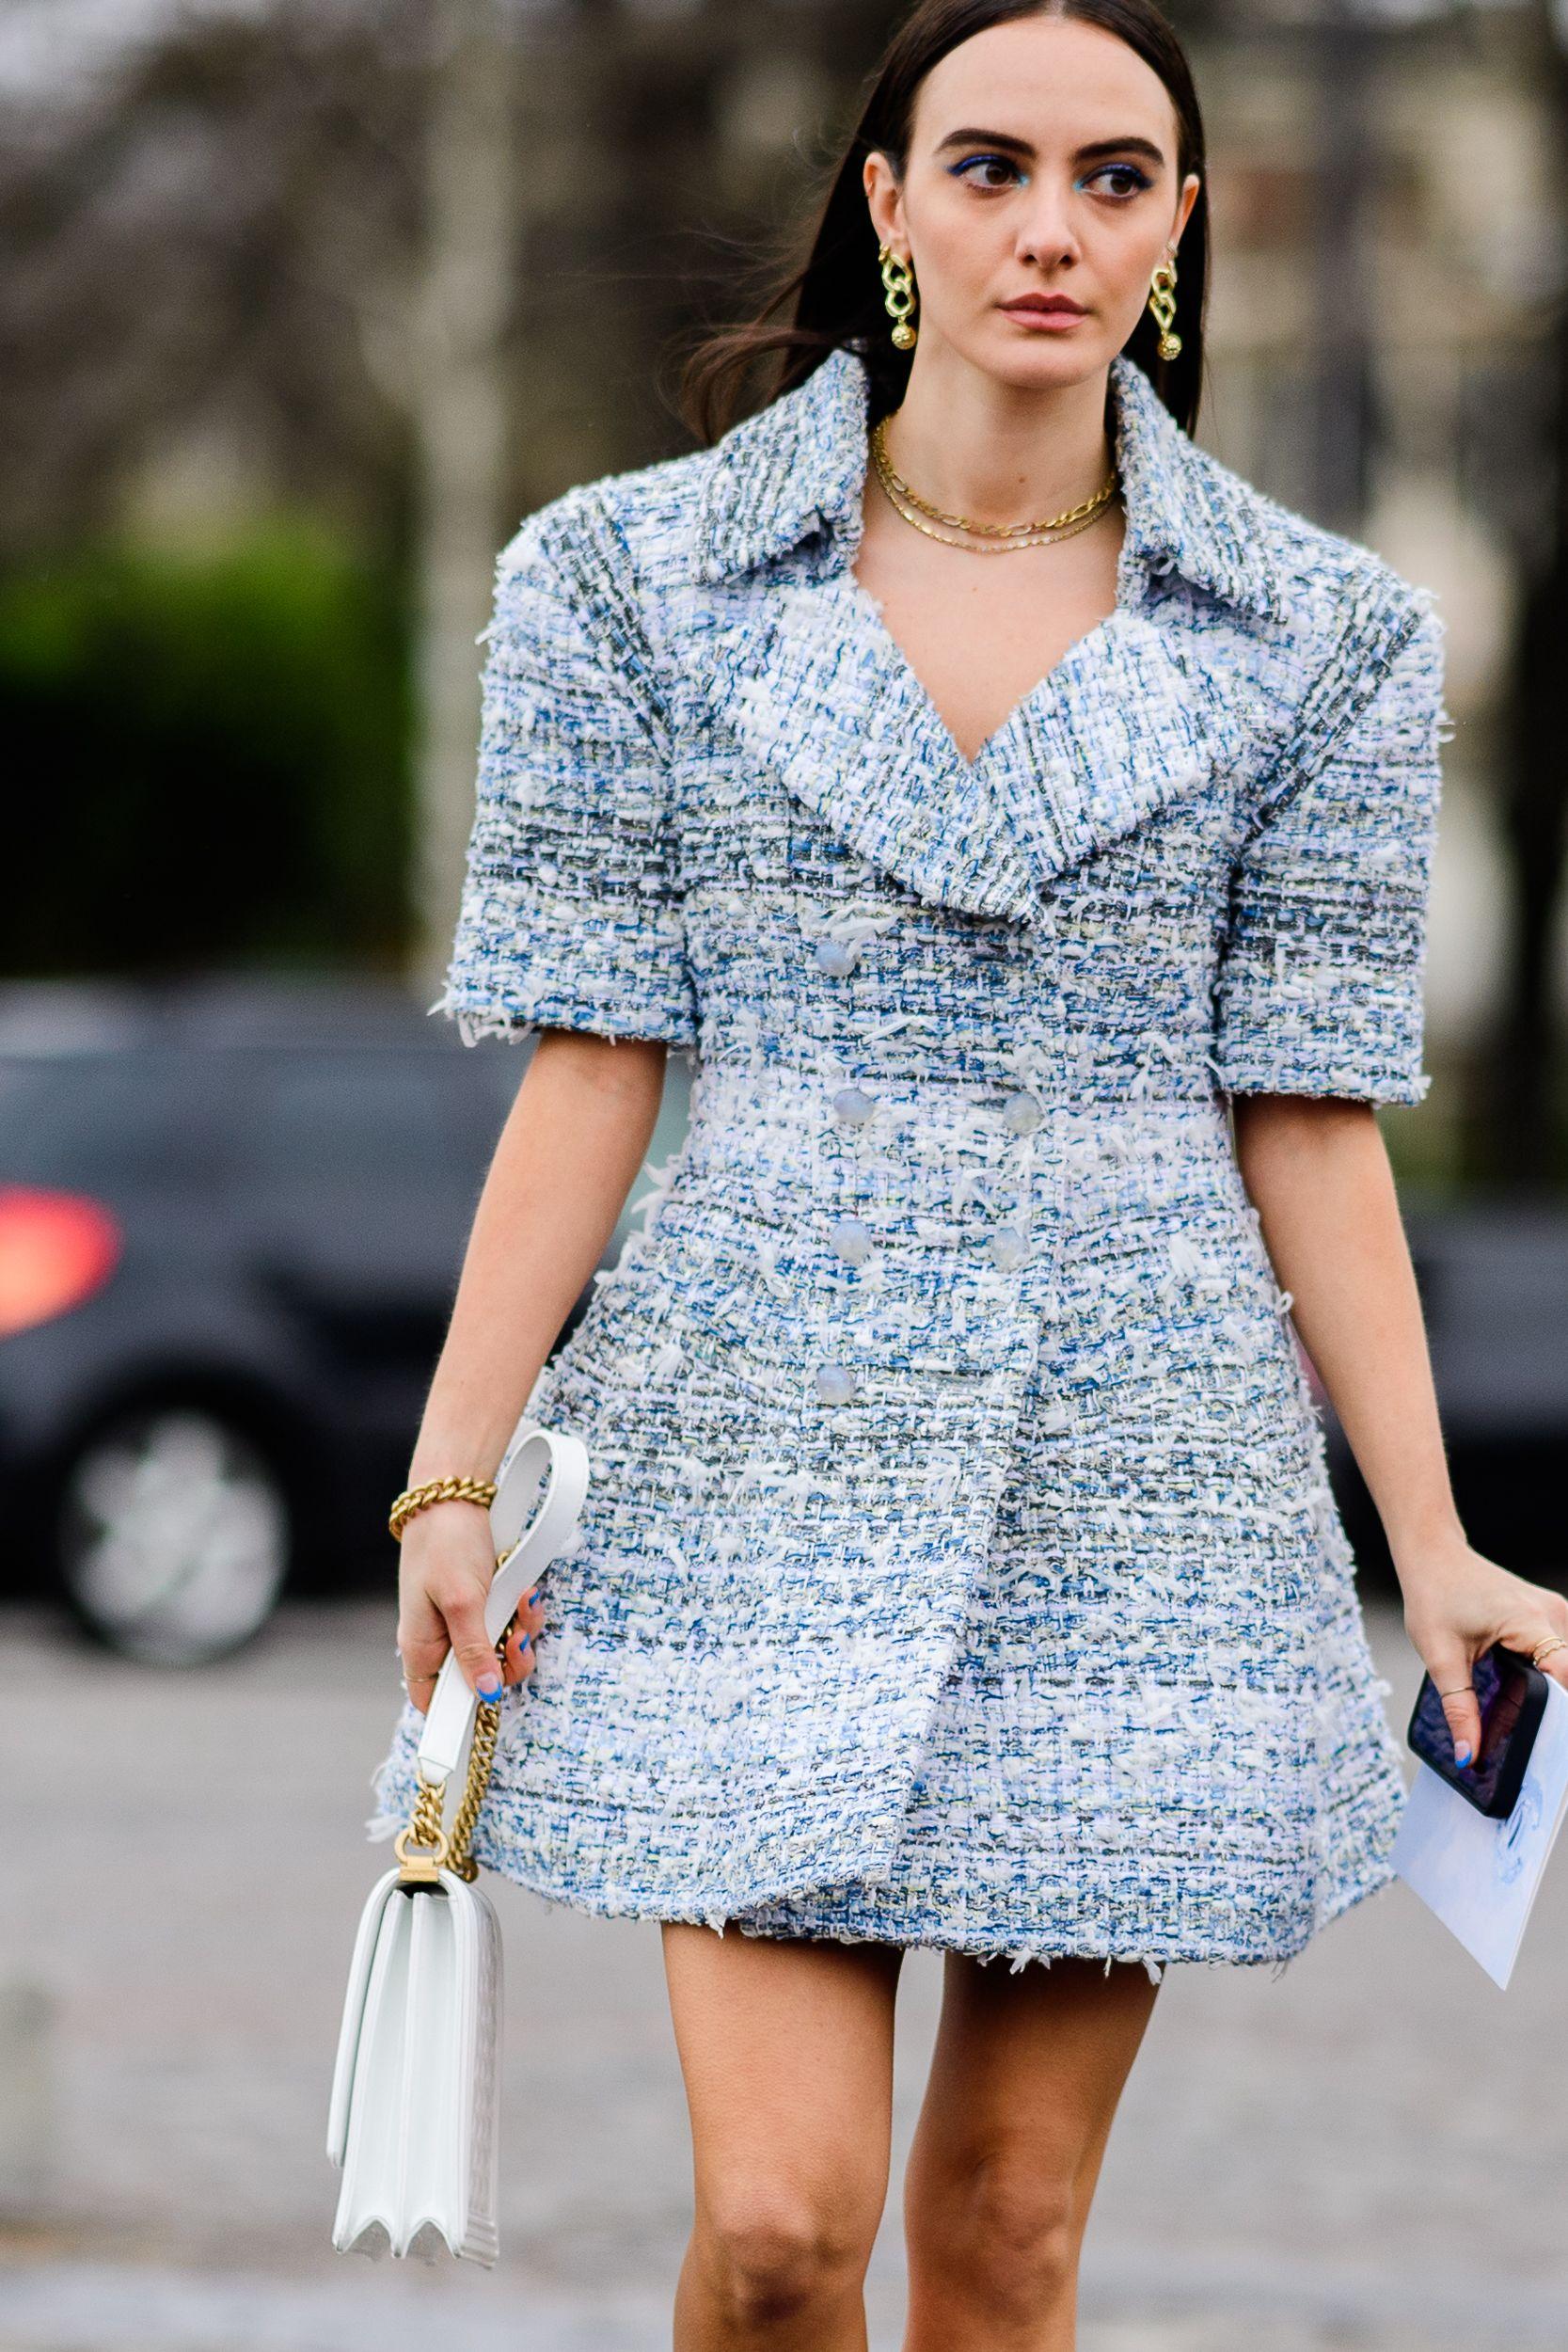 Thiết kế đầm vải tweed